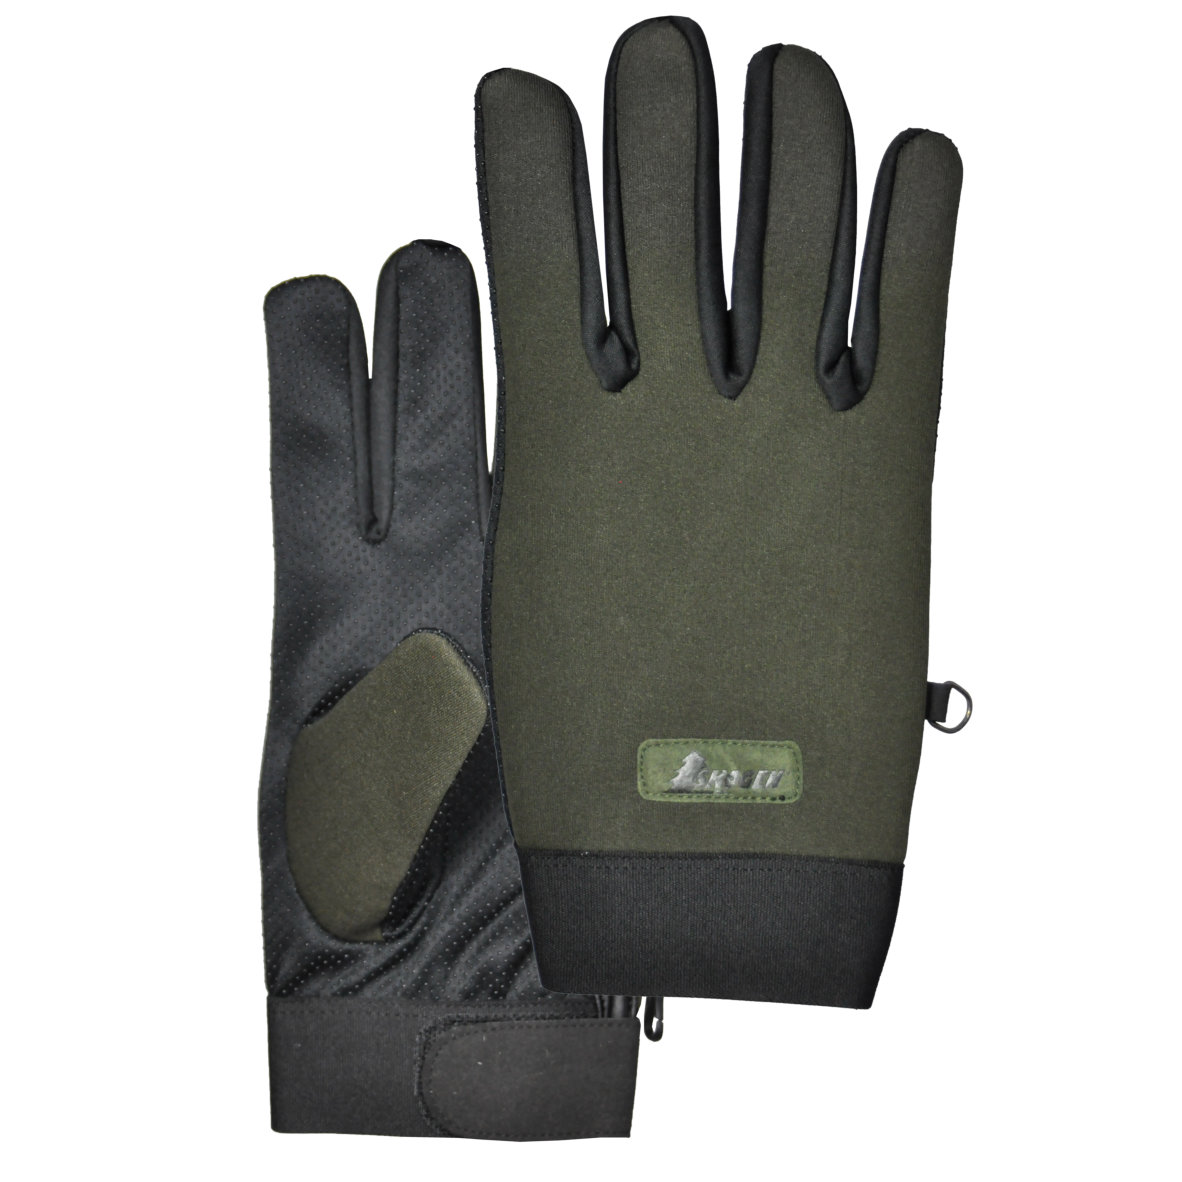 Jagd Soft Shell Handschuh